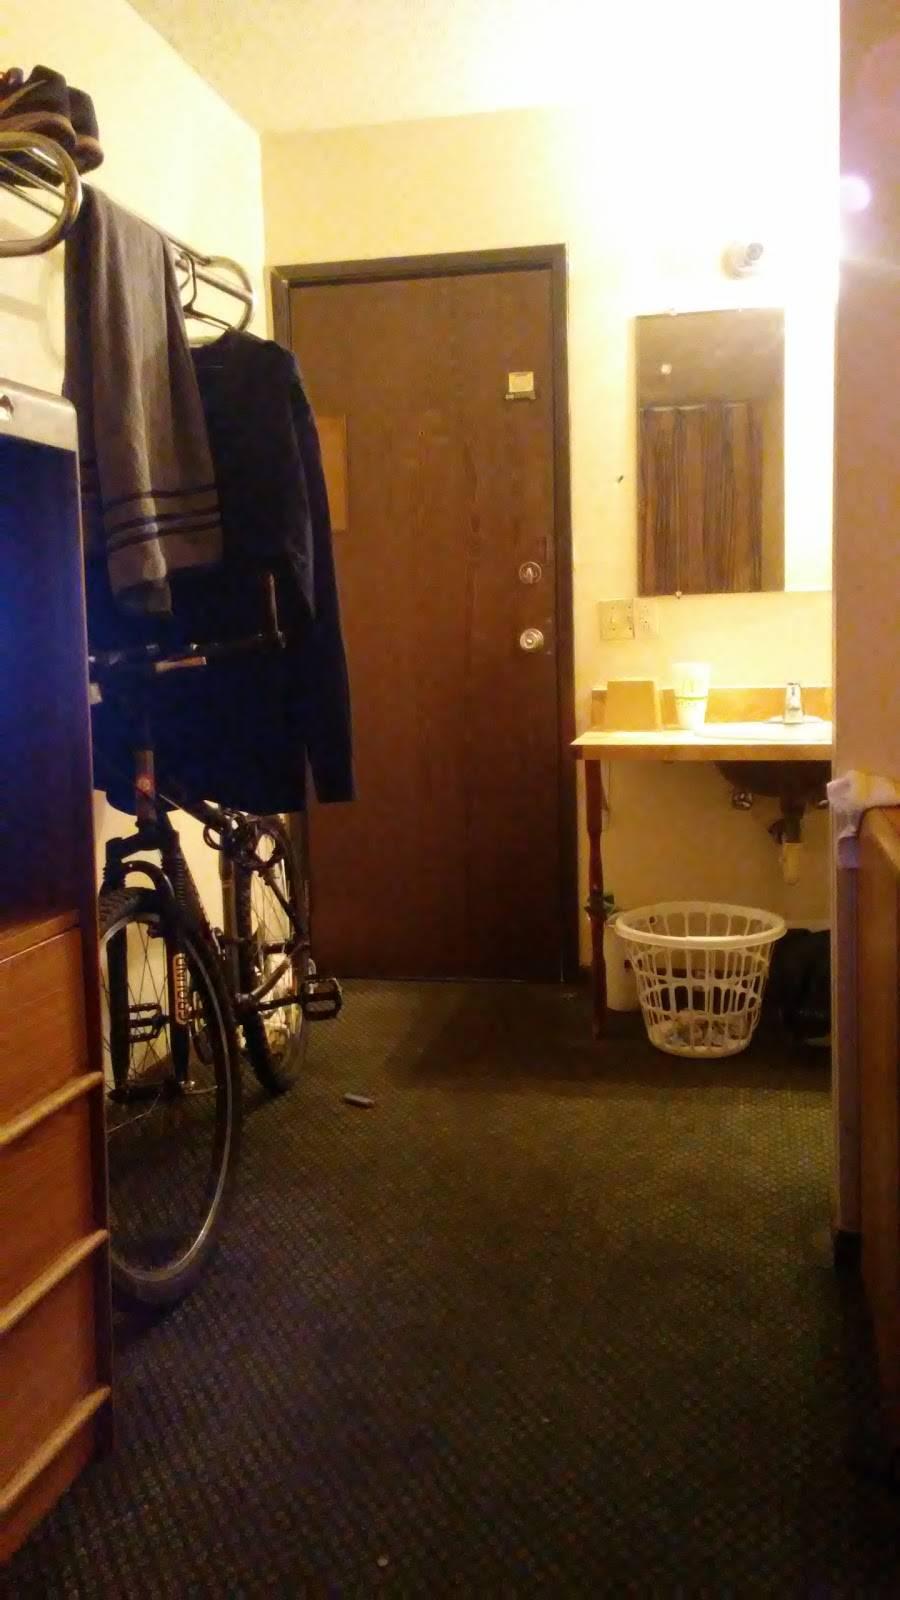 Regency Inn - lodging  | Photo 4 of 10 | Address: 6125 W Kellogg Dr, Wichita, KS 67209, USA | Phone: (316) 942-1341